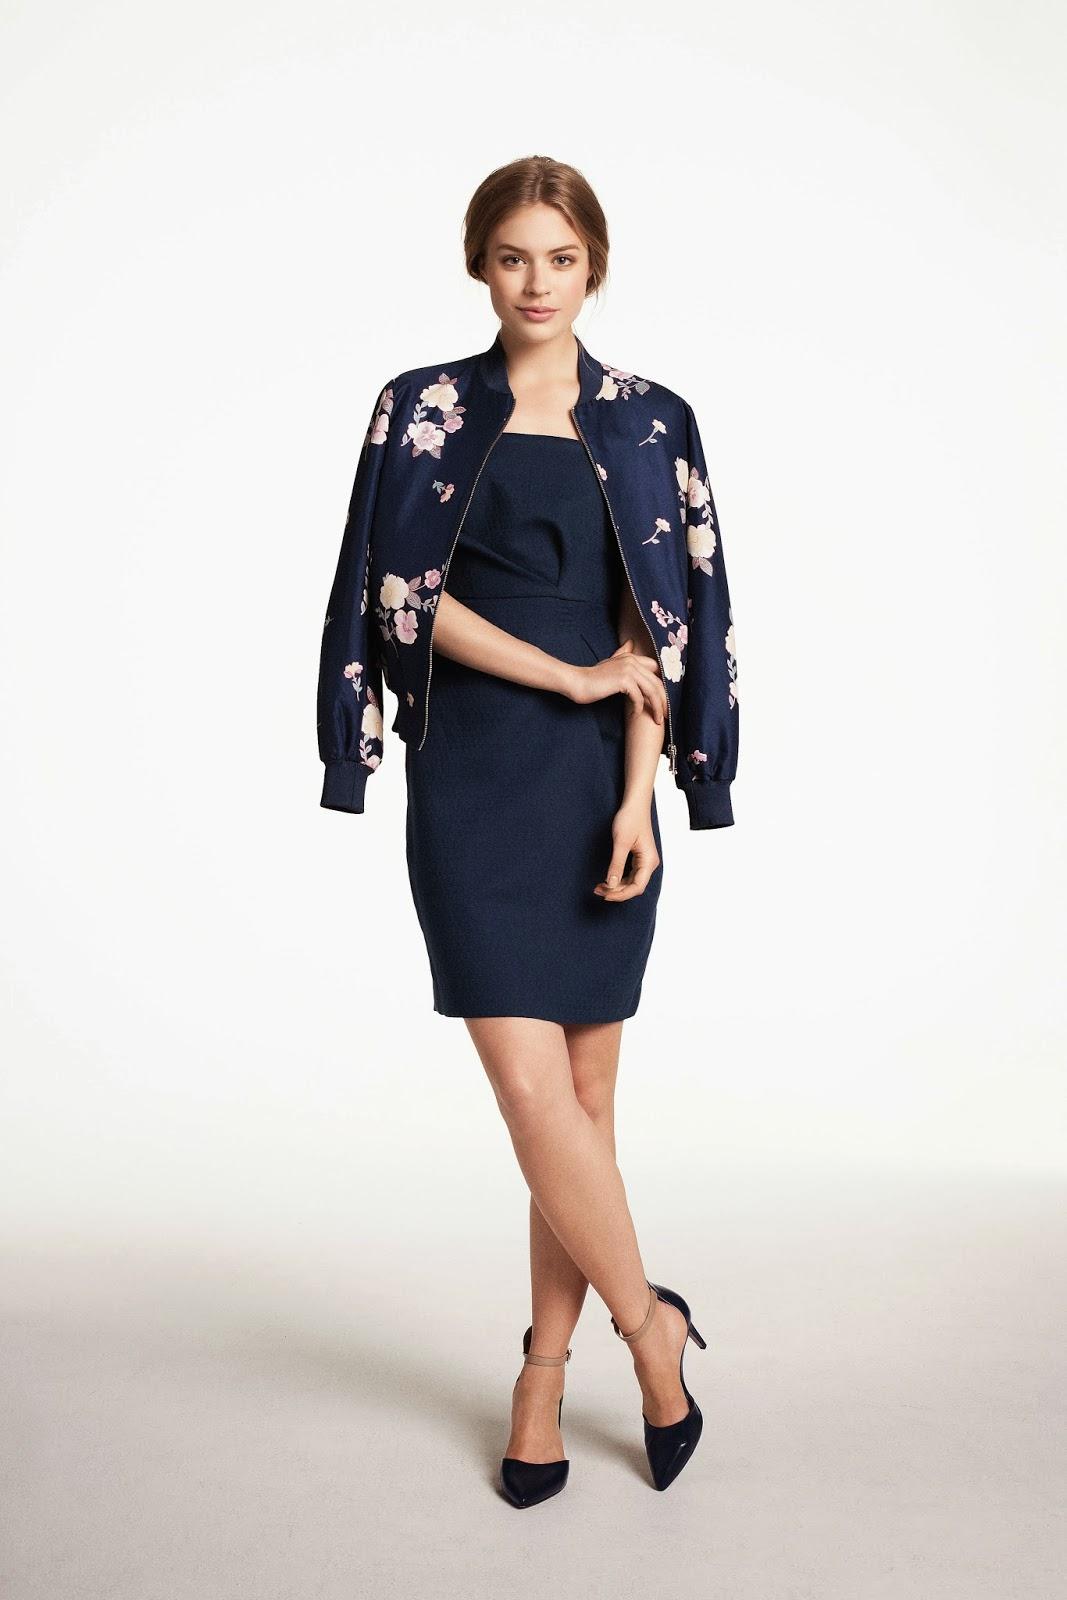 laurus fashiontipps gant women im fr hling sommer 2014 moderne und elegante outfits im stilmix. Black Bedroom Furniture Sets. Home Design Ideas